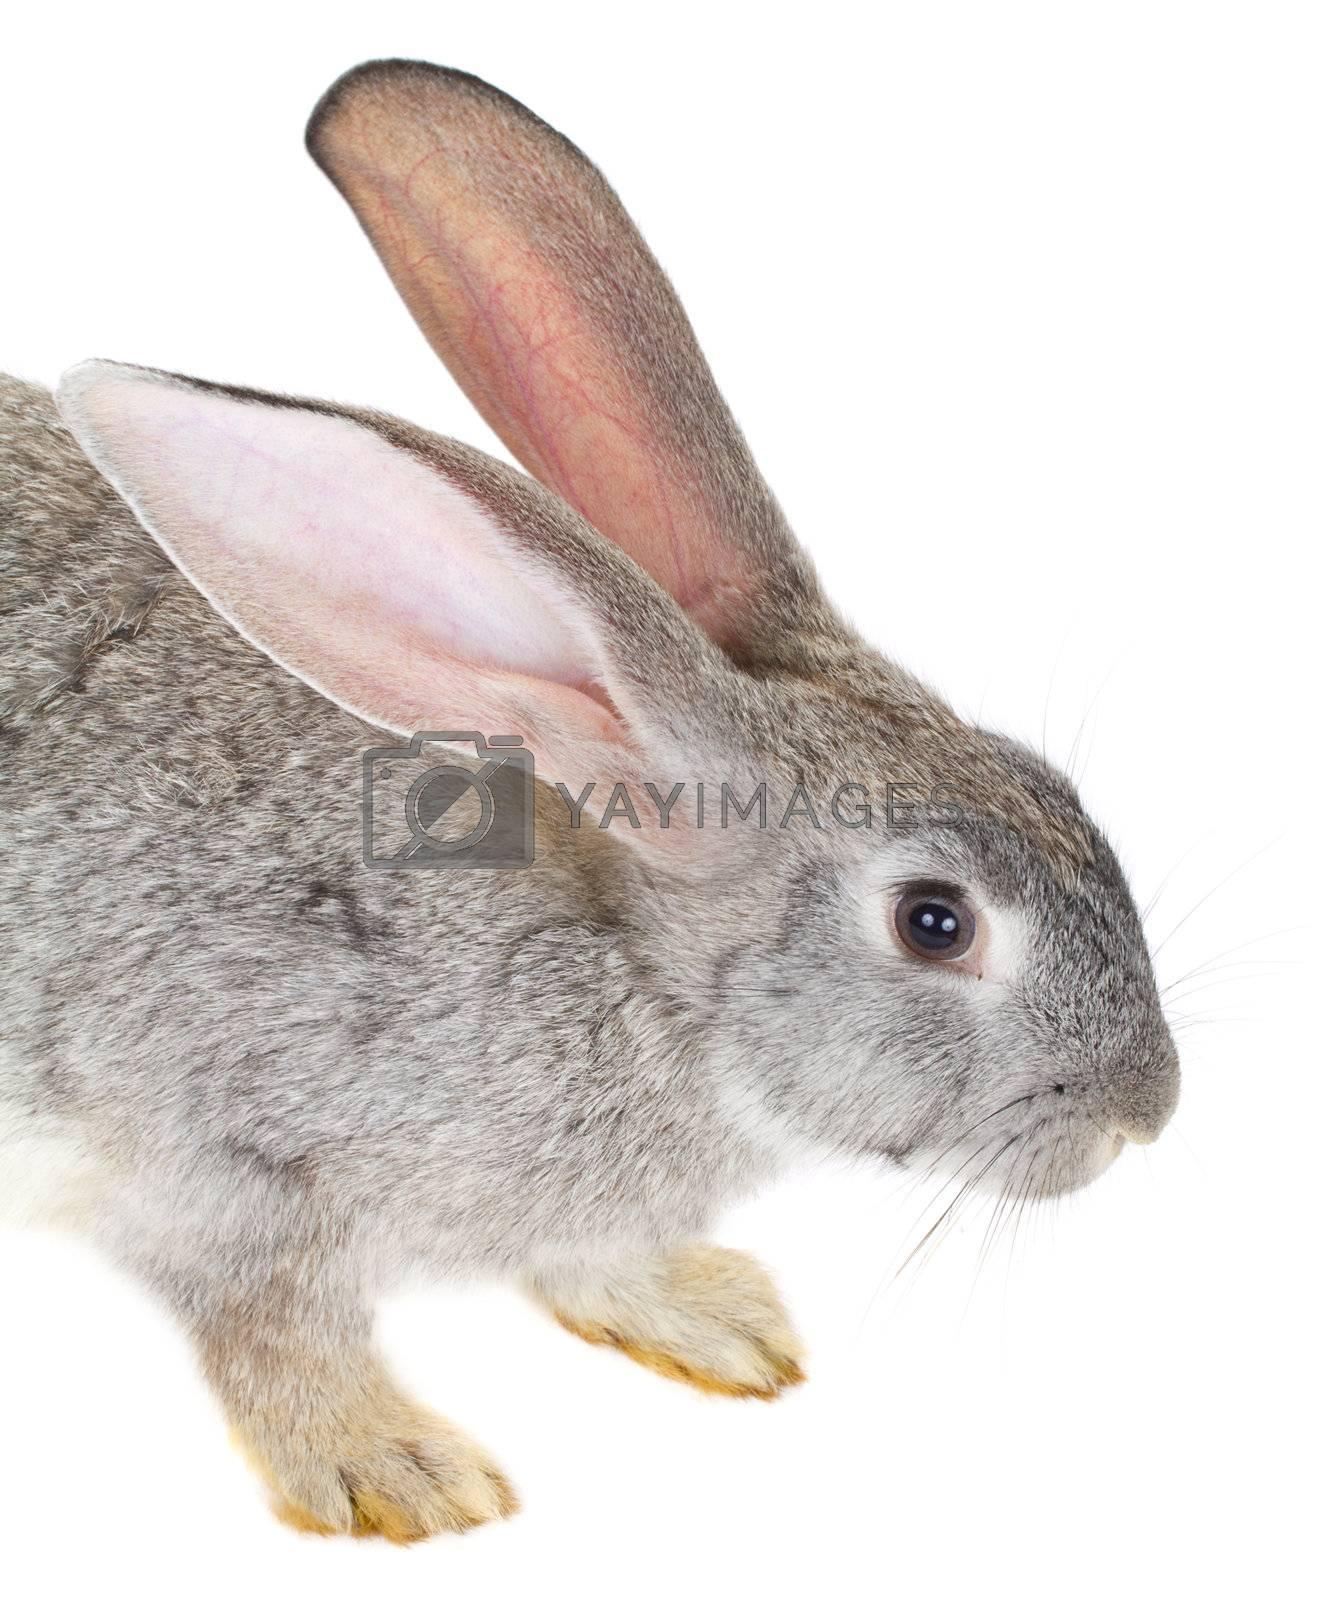 close-up rabbit, isolated on white